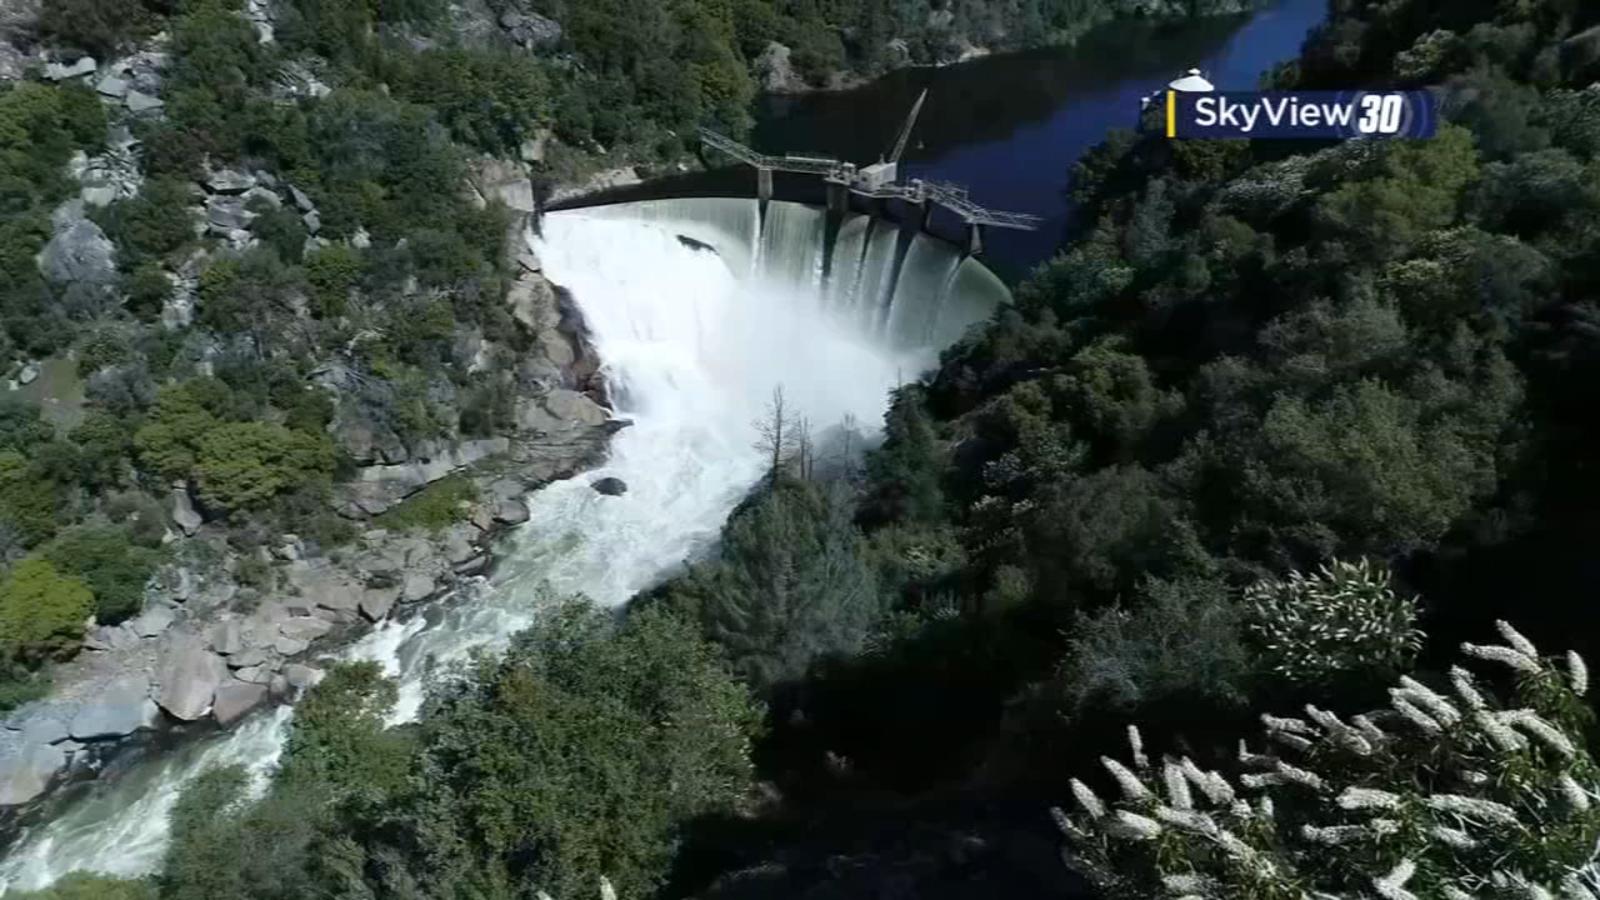 CA legislators want Gov. Newsom to declare state of emergency over water 'crisis' - KFSN-TV